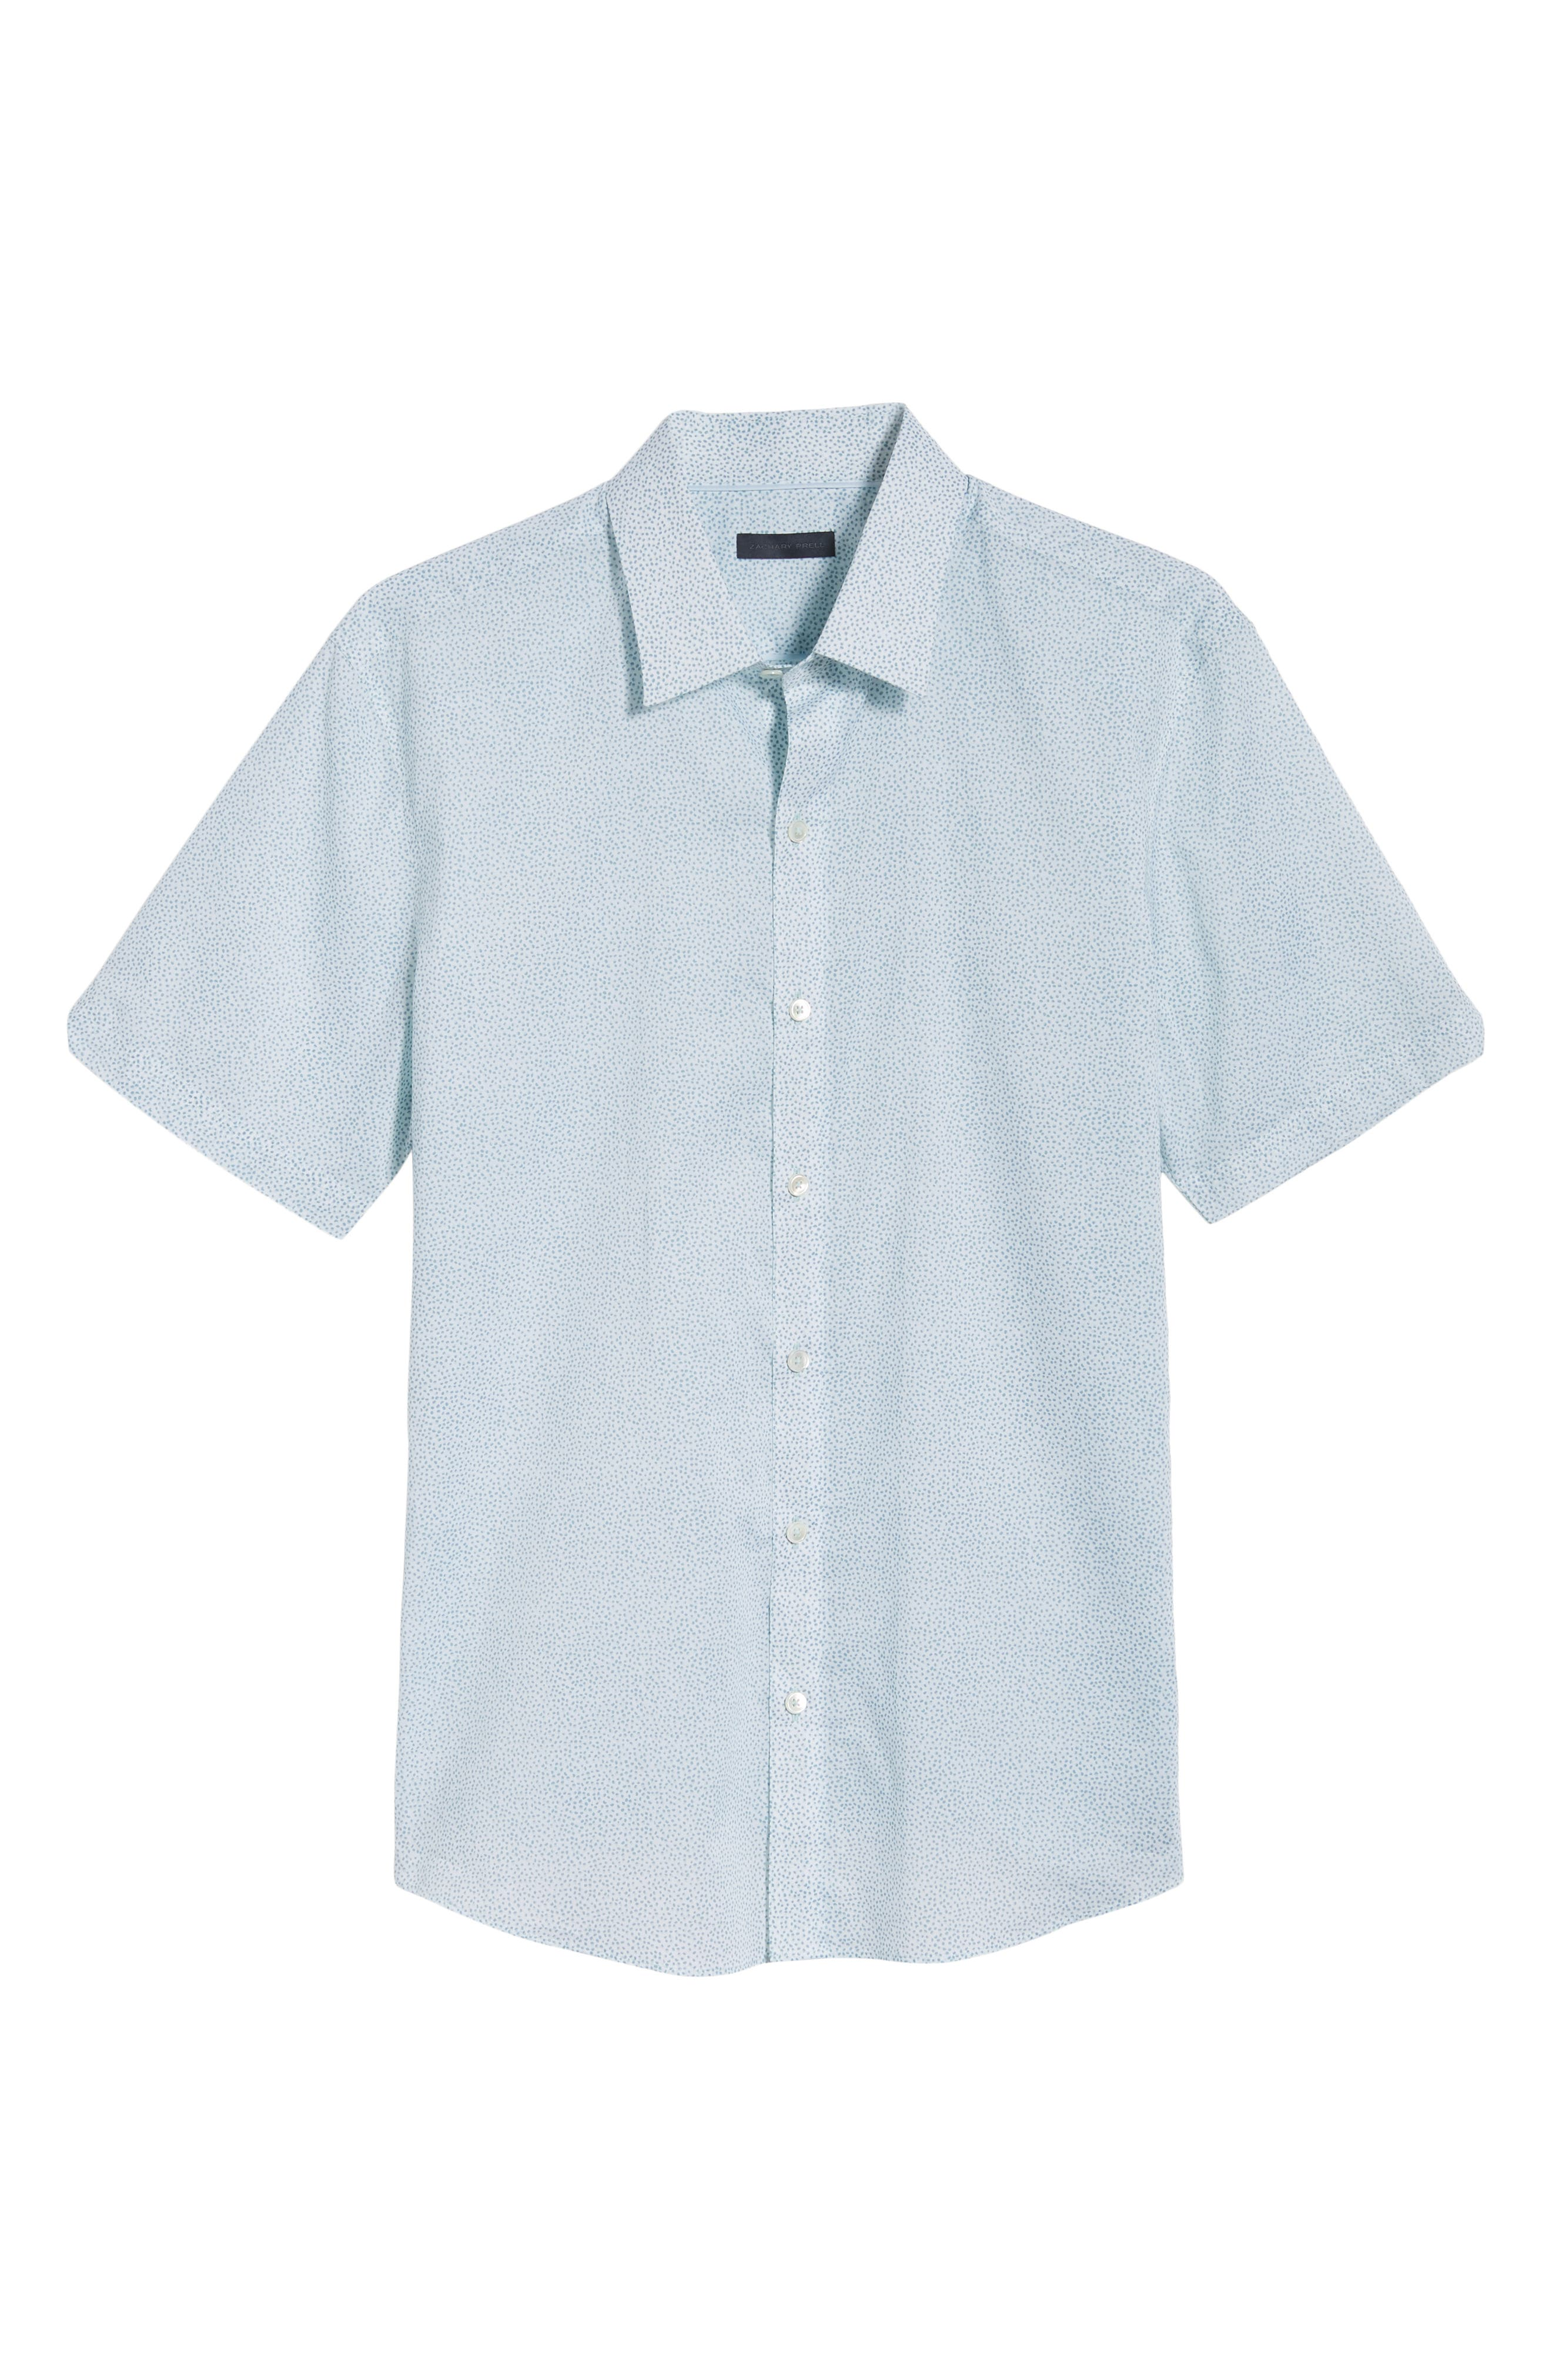 Fung Regular Fit Sport Shirt,                             Alternate thumbnail 6, color,                             WHITE